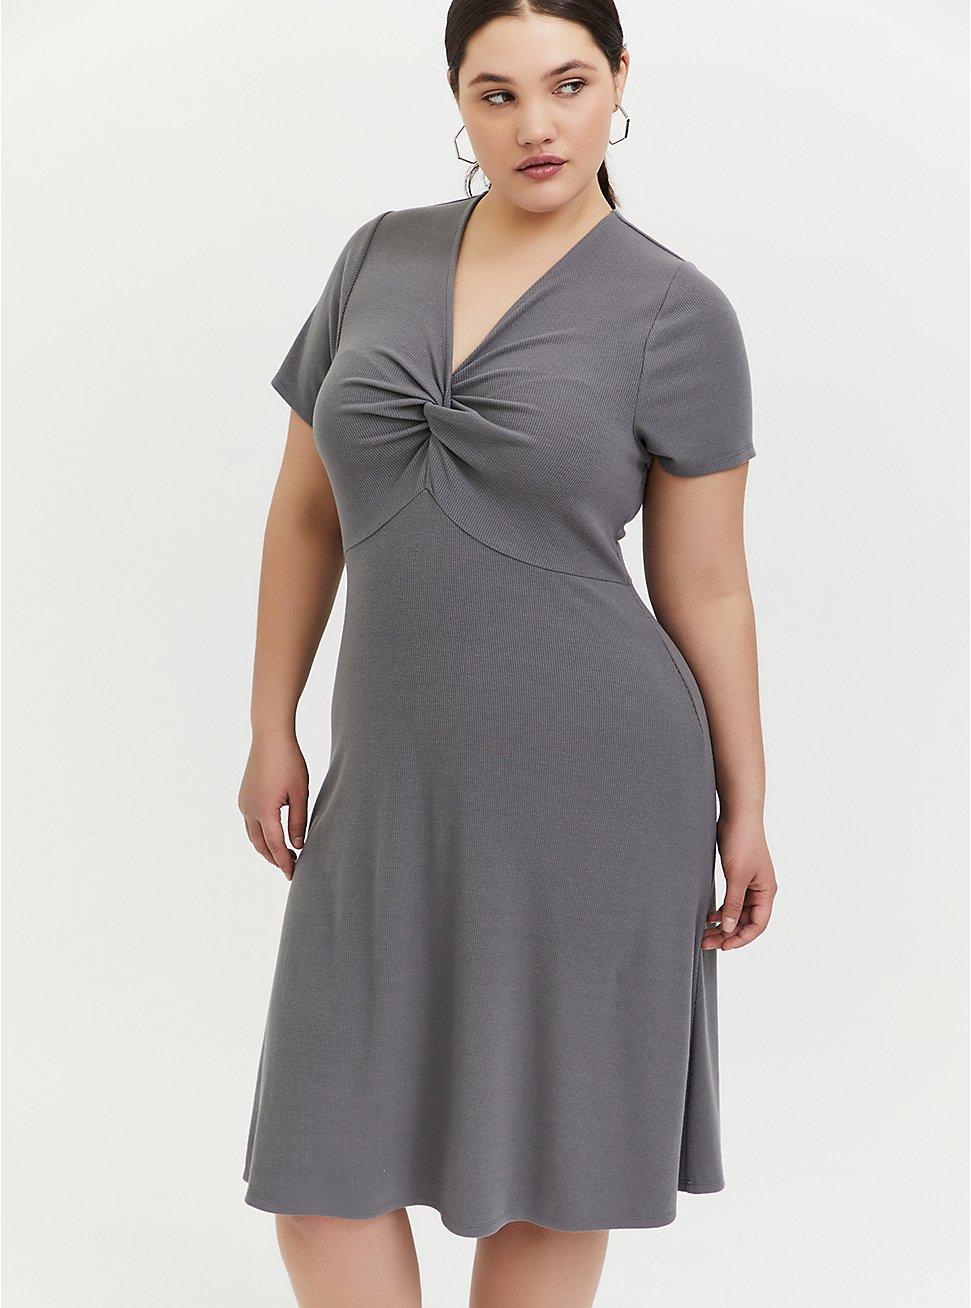 Grey Rib Twist Front Skater Dress, SMOKED PEARL, hi-res